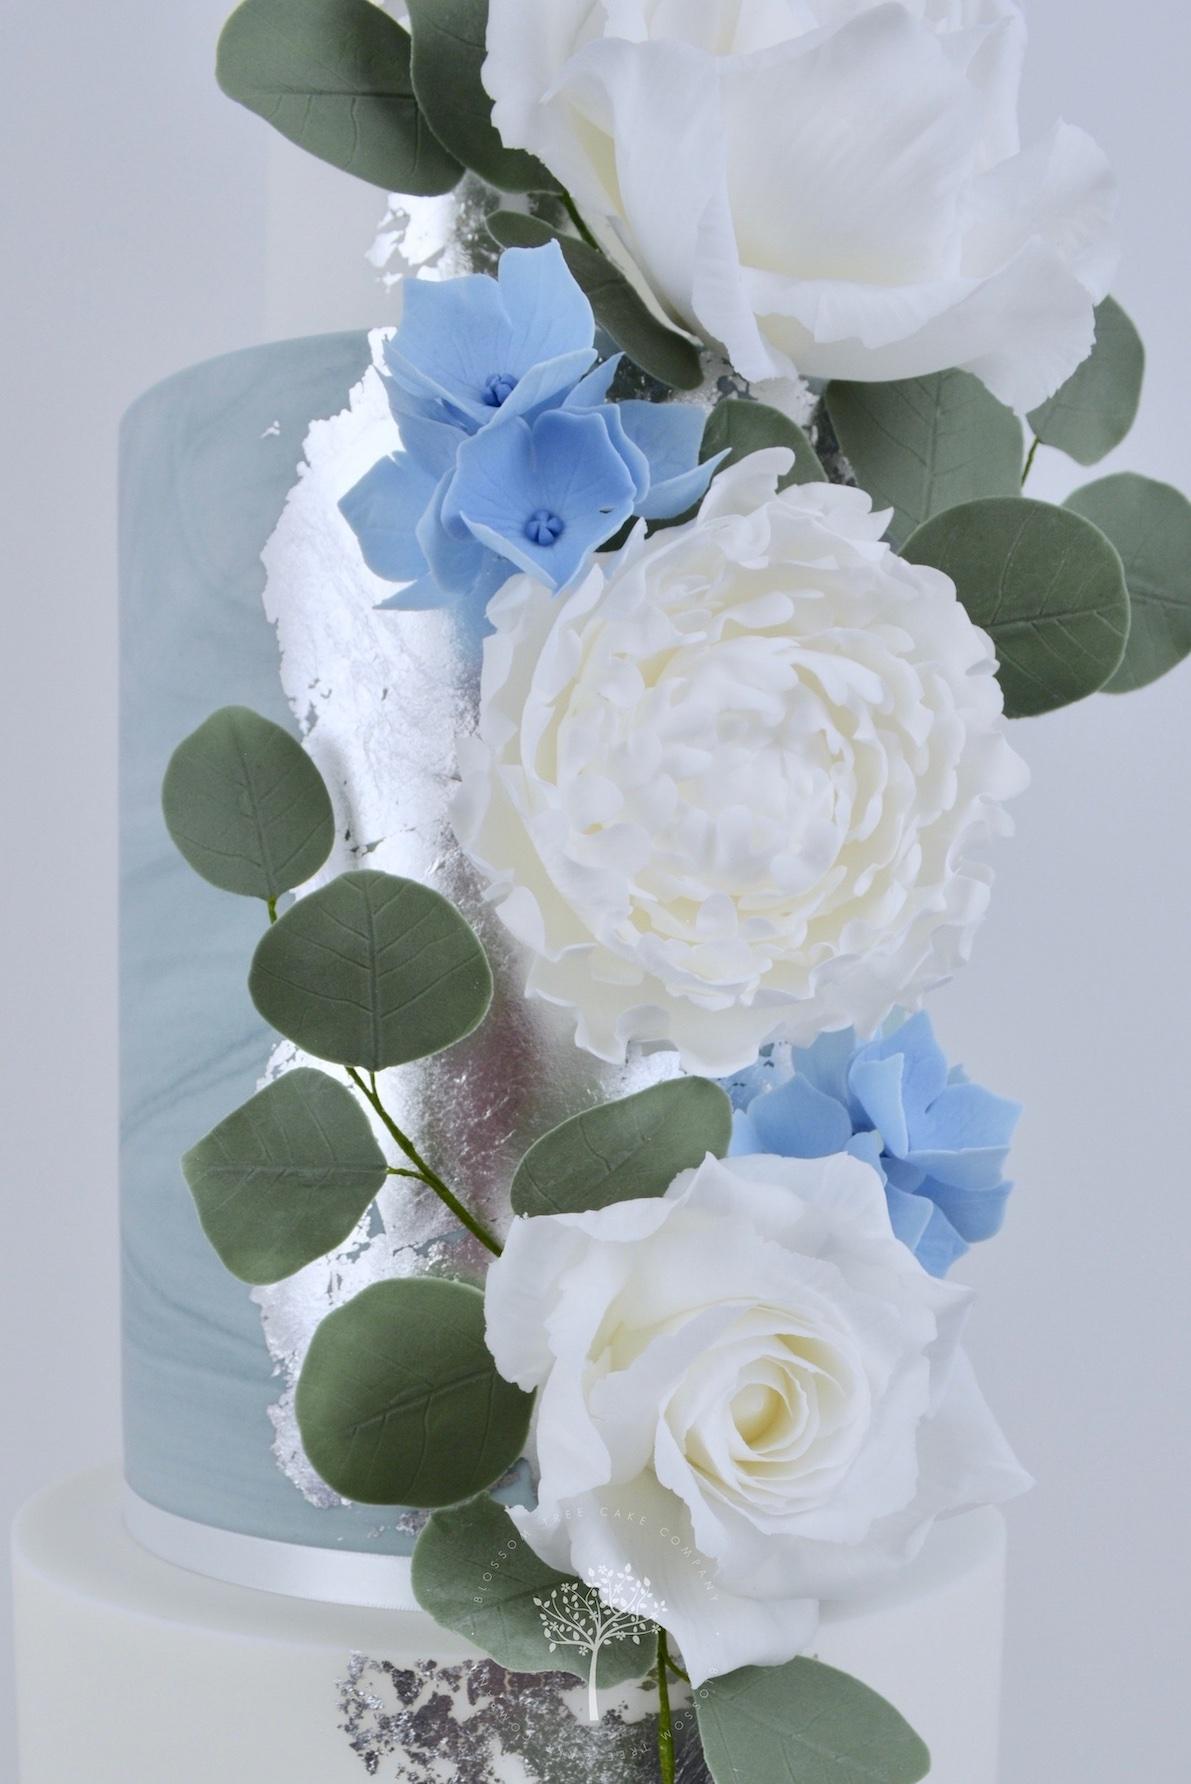 Peonies & Roses wedding cake by Blossom Tree Cake Company Harrogate North Yorkshire - sugar flowers.jpg